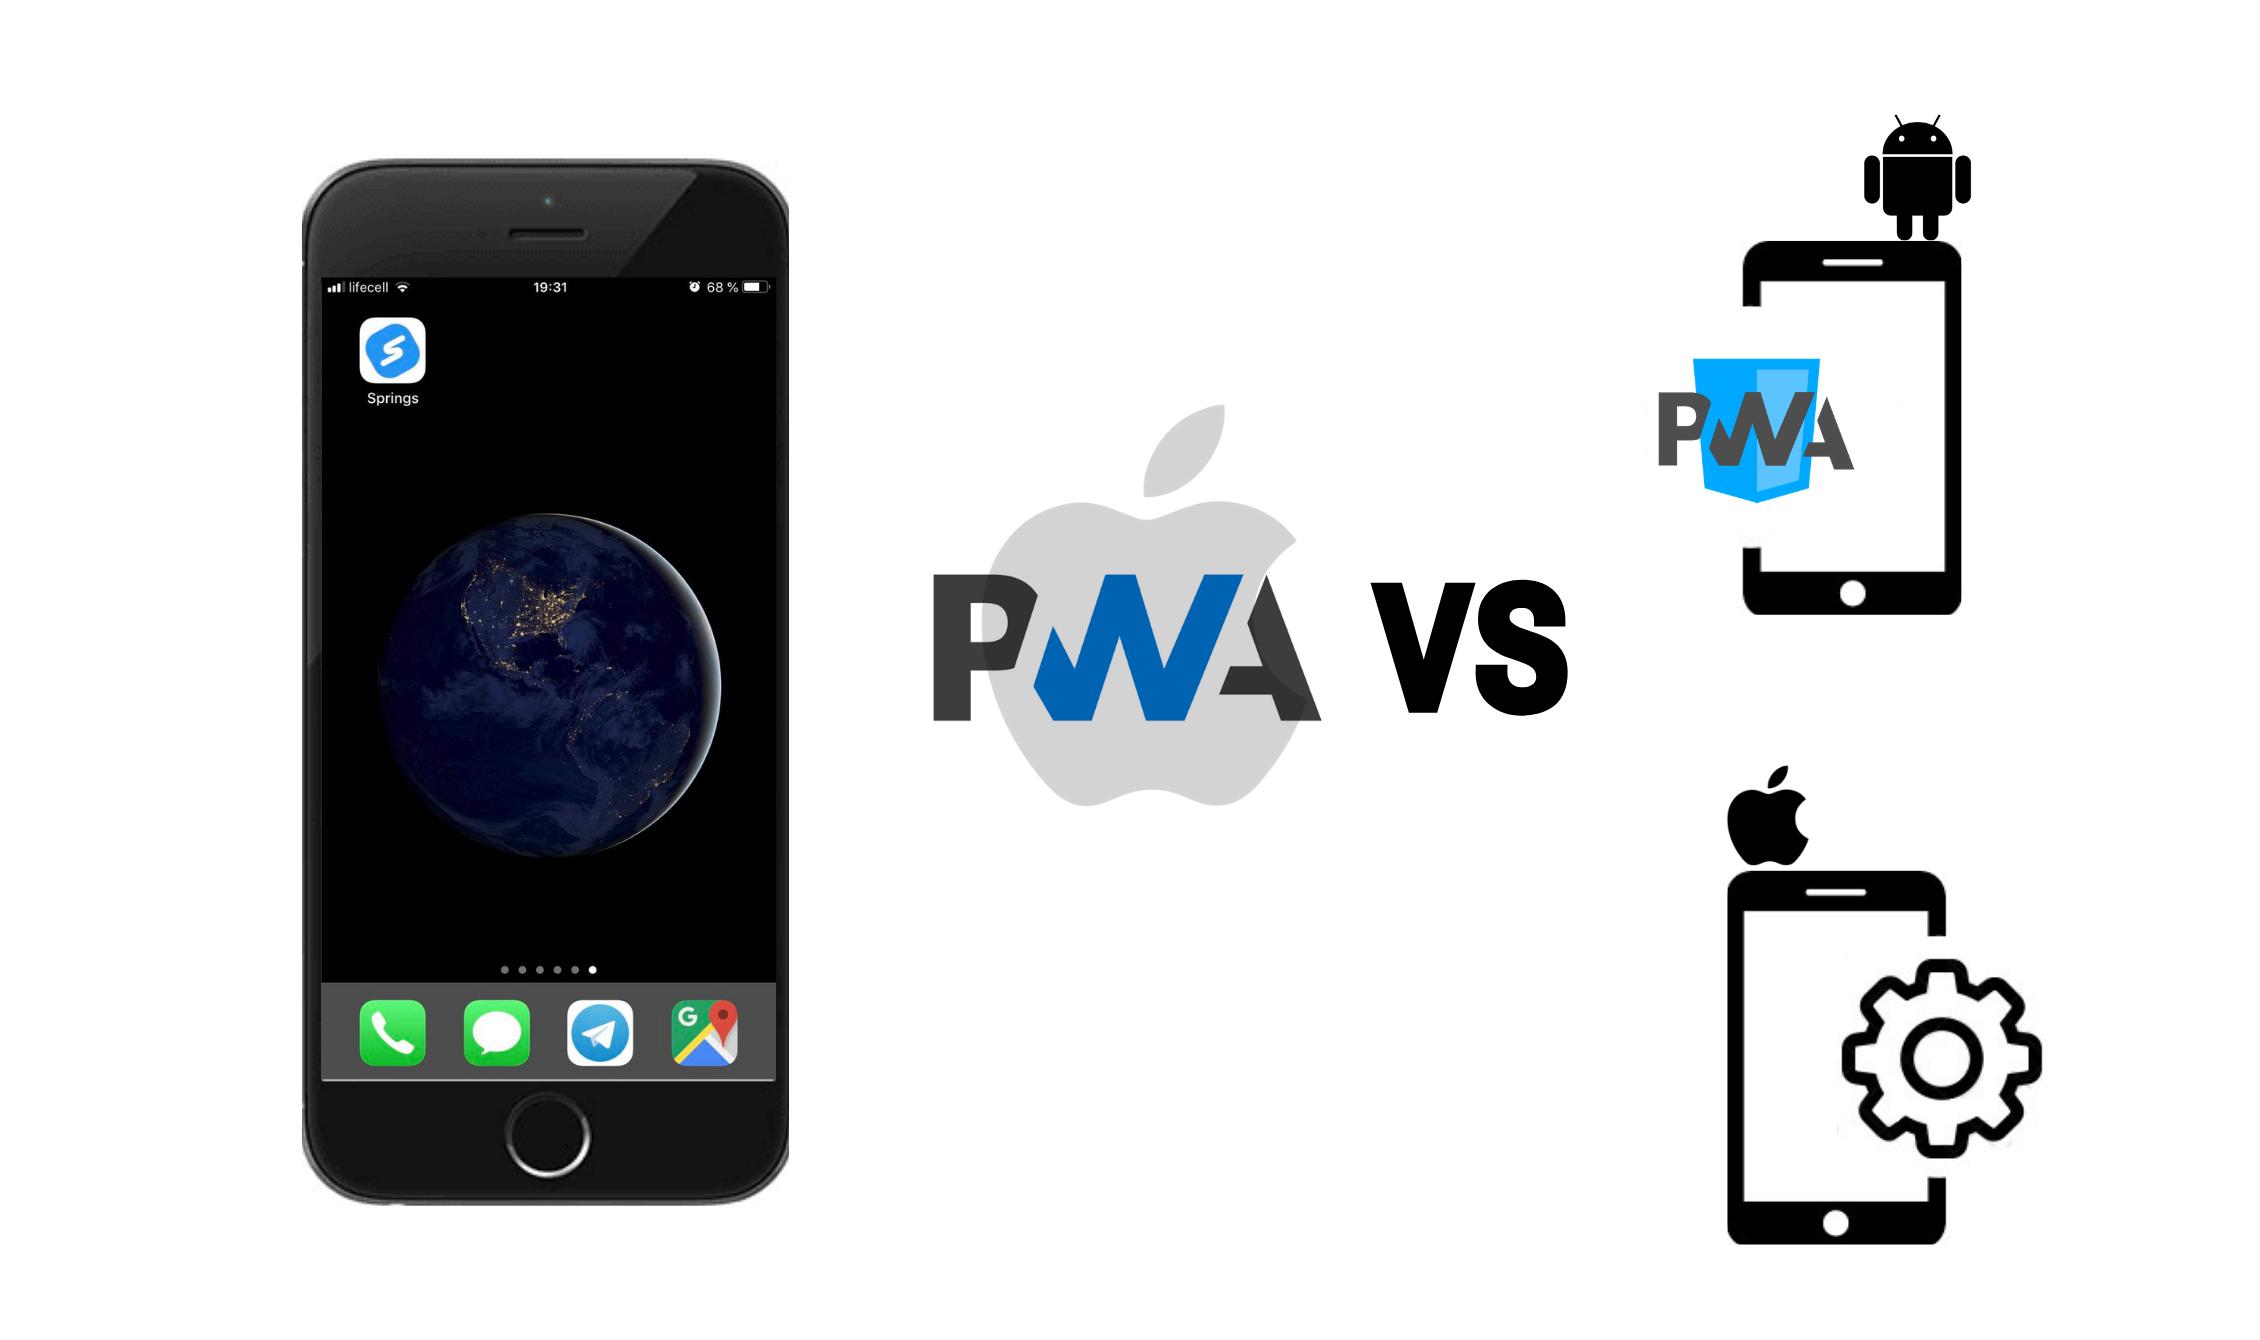 PWA iOS vs PWA Android and iOS native